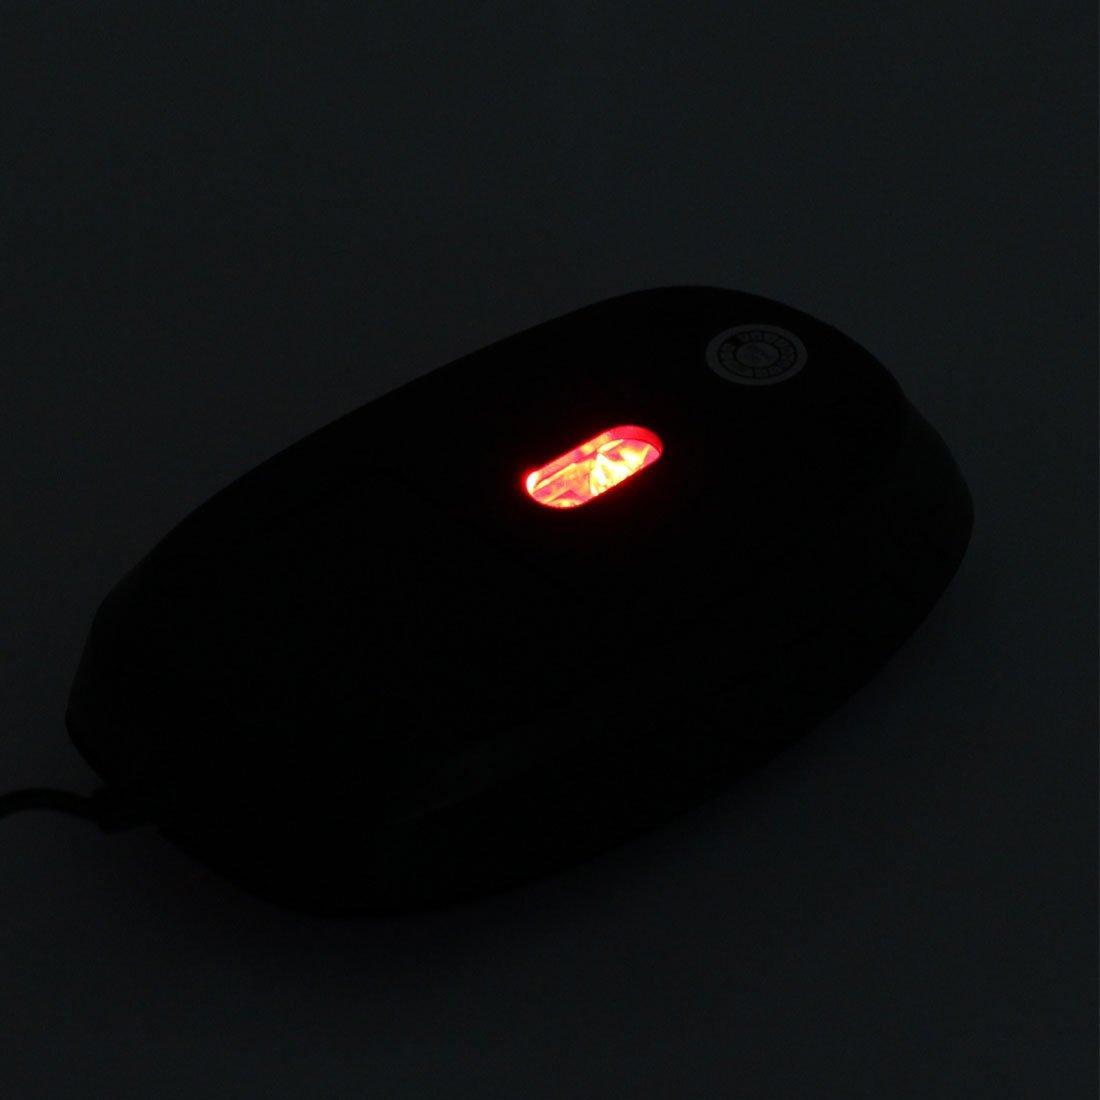 Amazon.com: eDealMax PC portátil DE 3 botones de la luz roja LED USB ratón óptico de 800 DPI ratones púrpura: Electronics